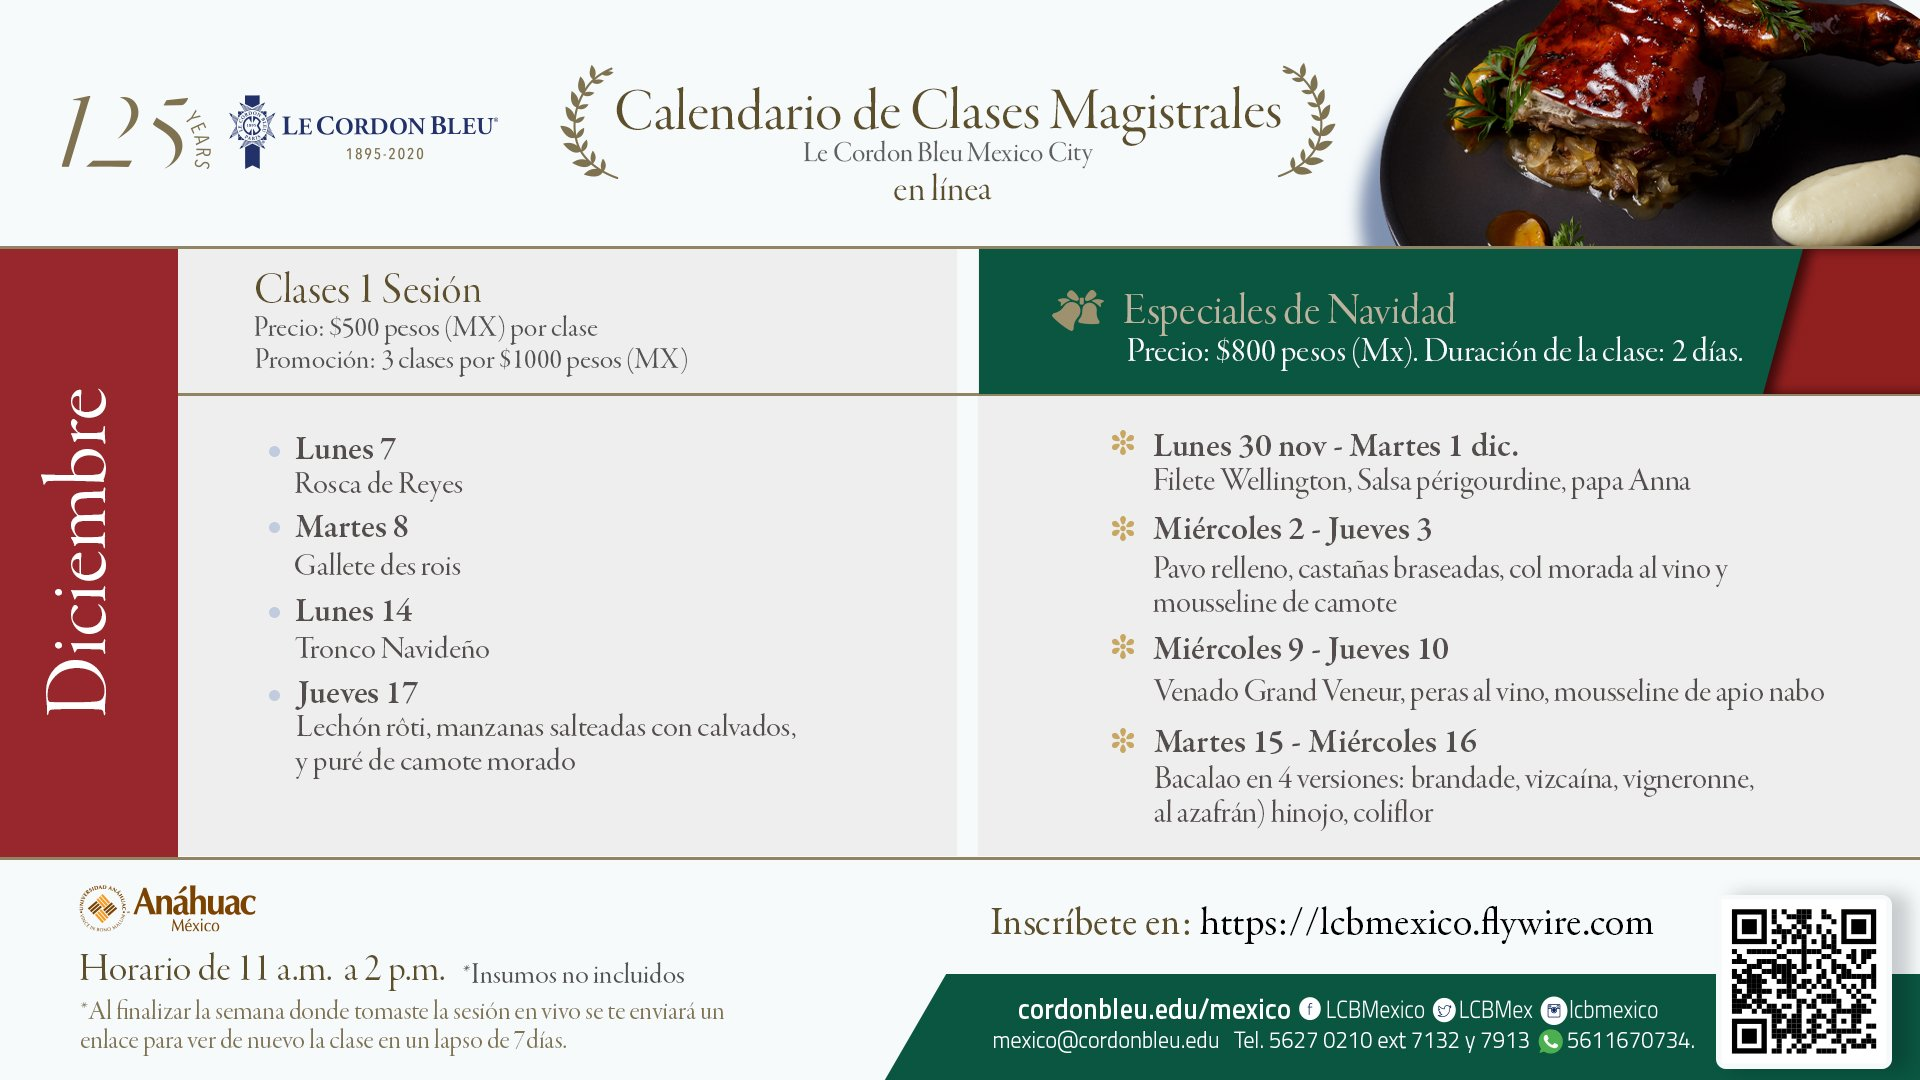 Calendario Clases magistrales en línea